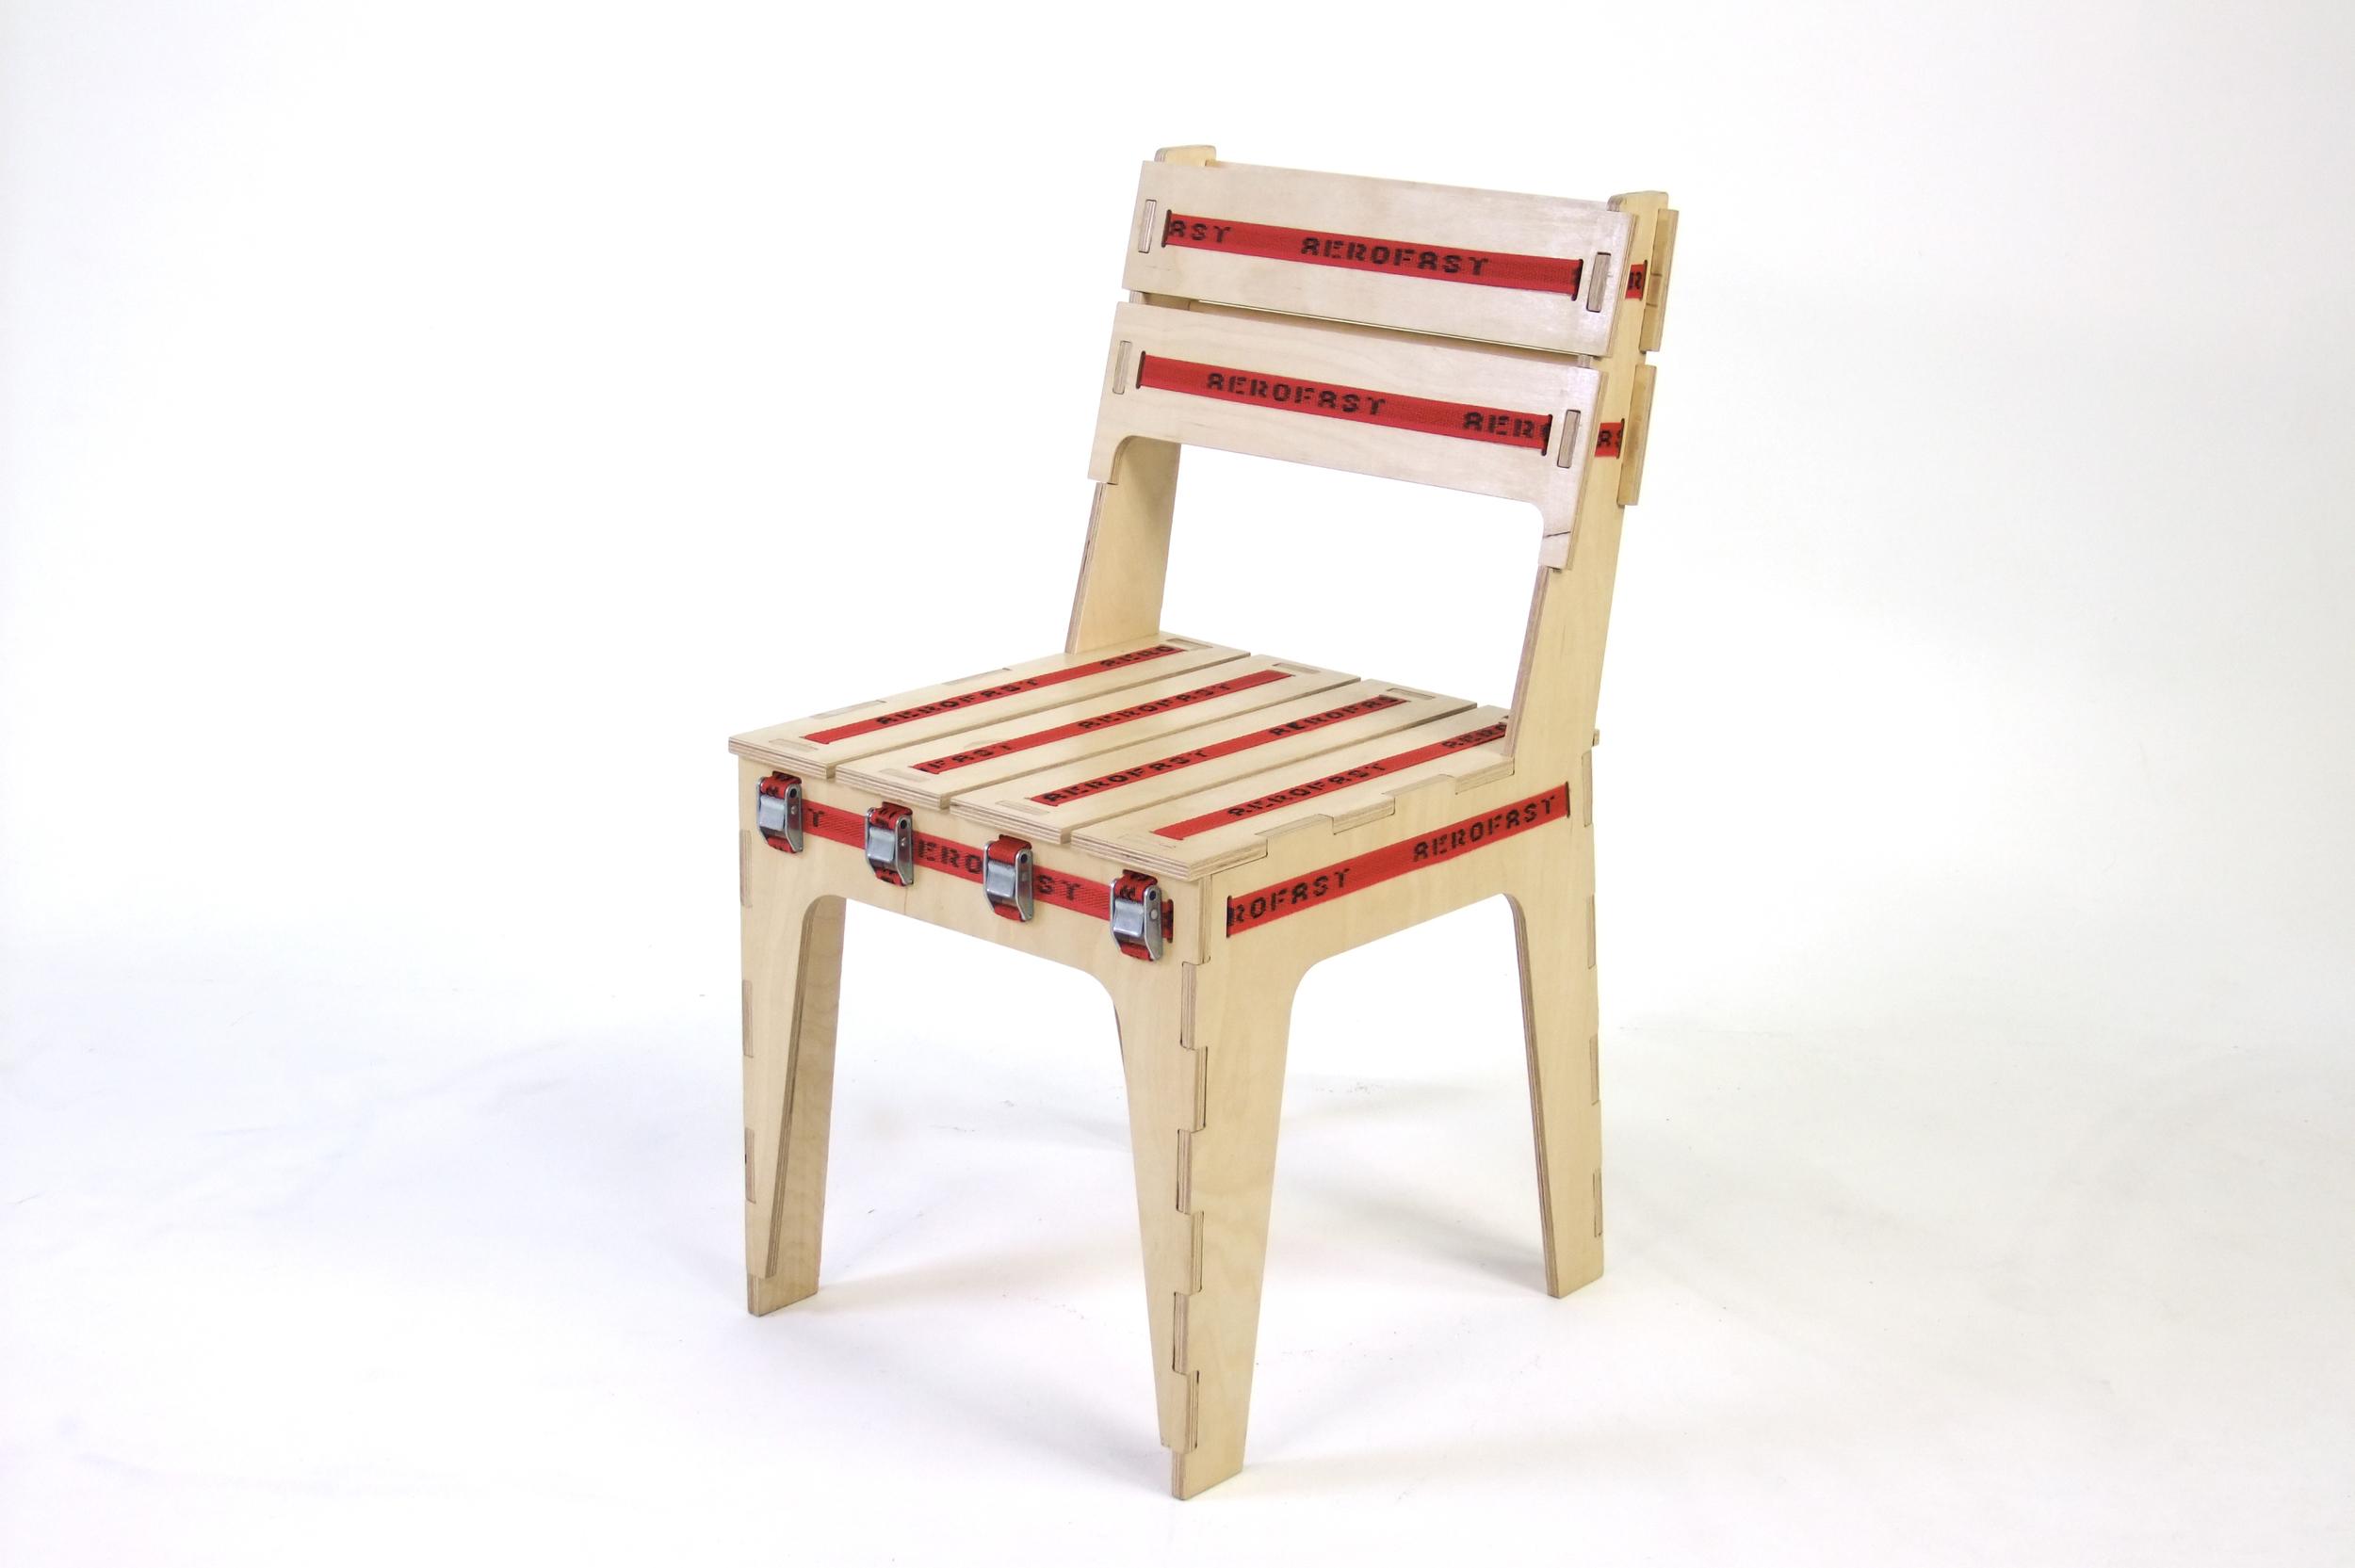 Strapchair. Glenn Catchpole. Massey University.